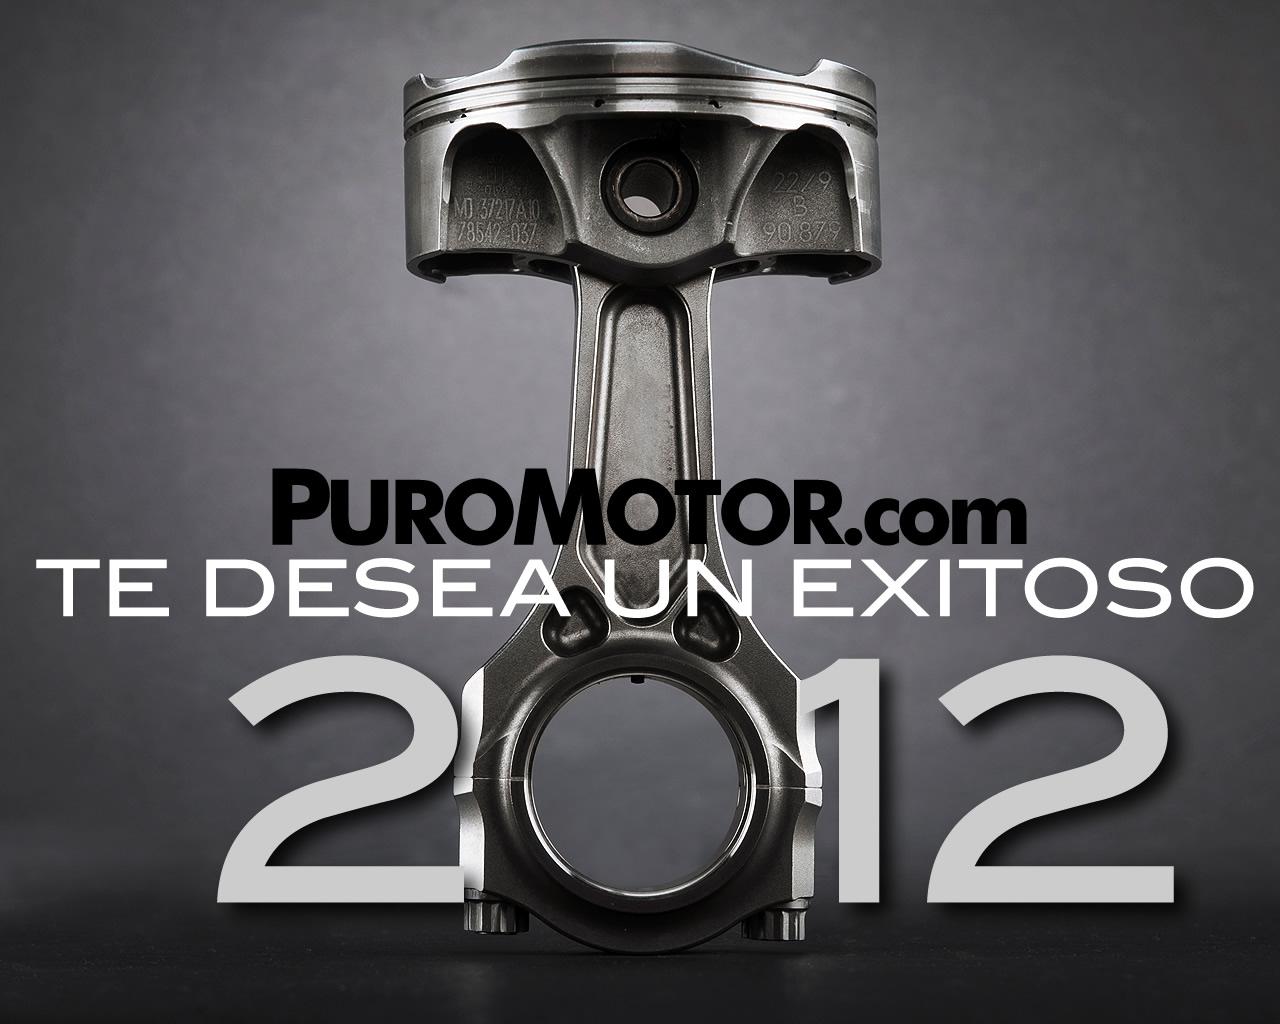 Feliz_2012_Wallpaper_Grey_Black_Puro_Motor_Racing